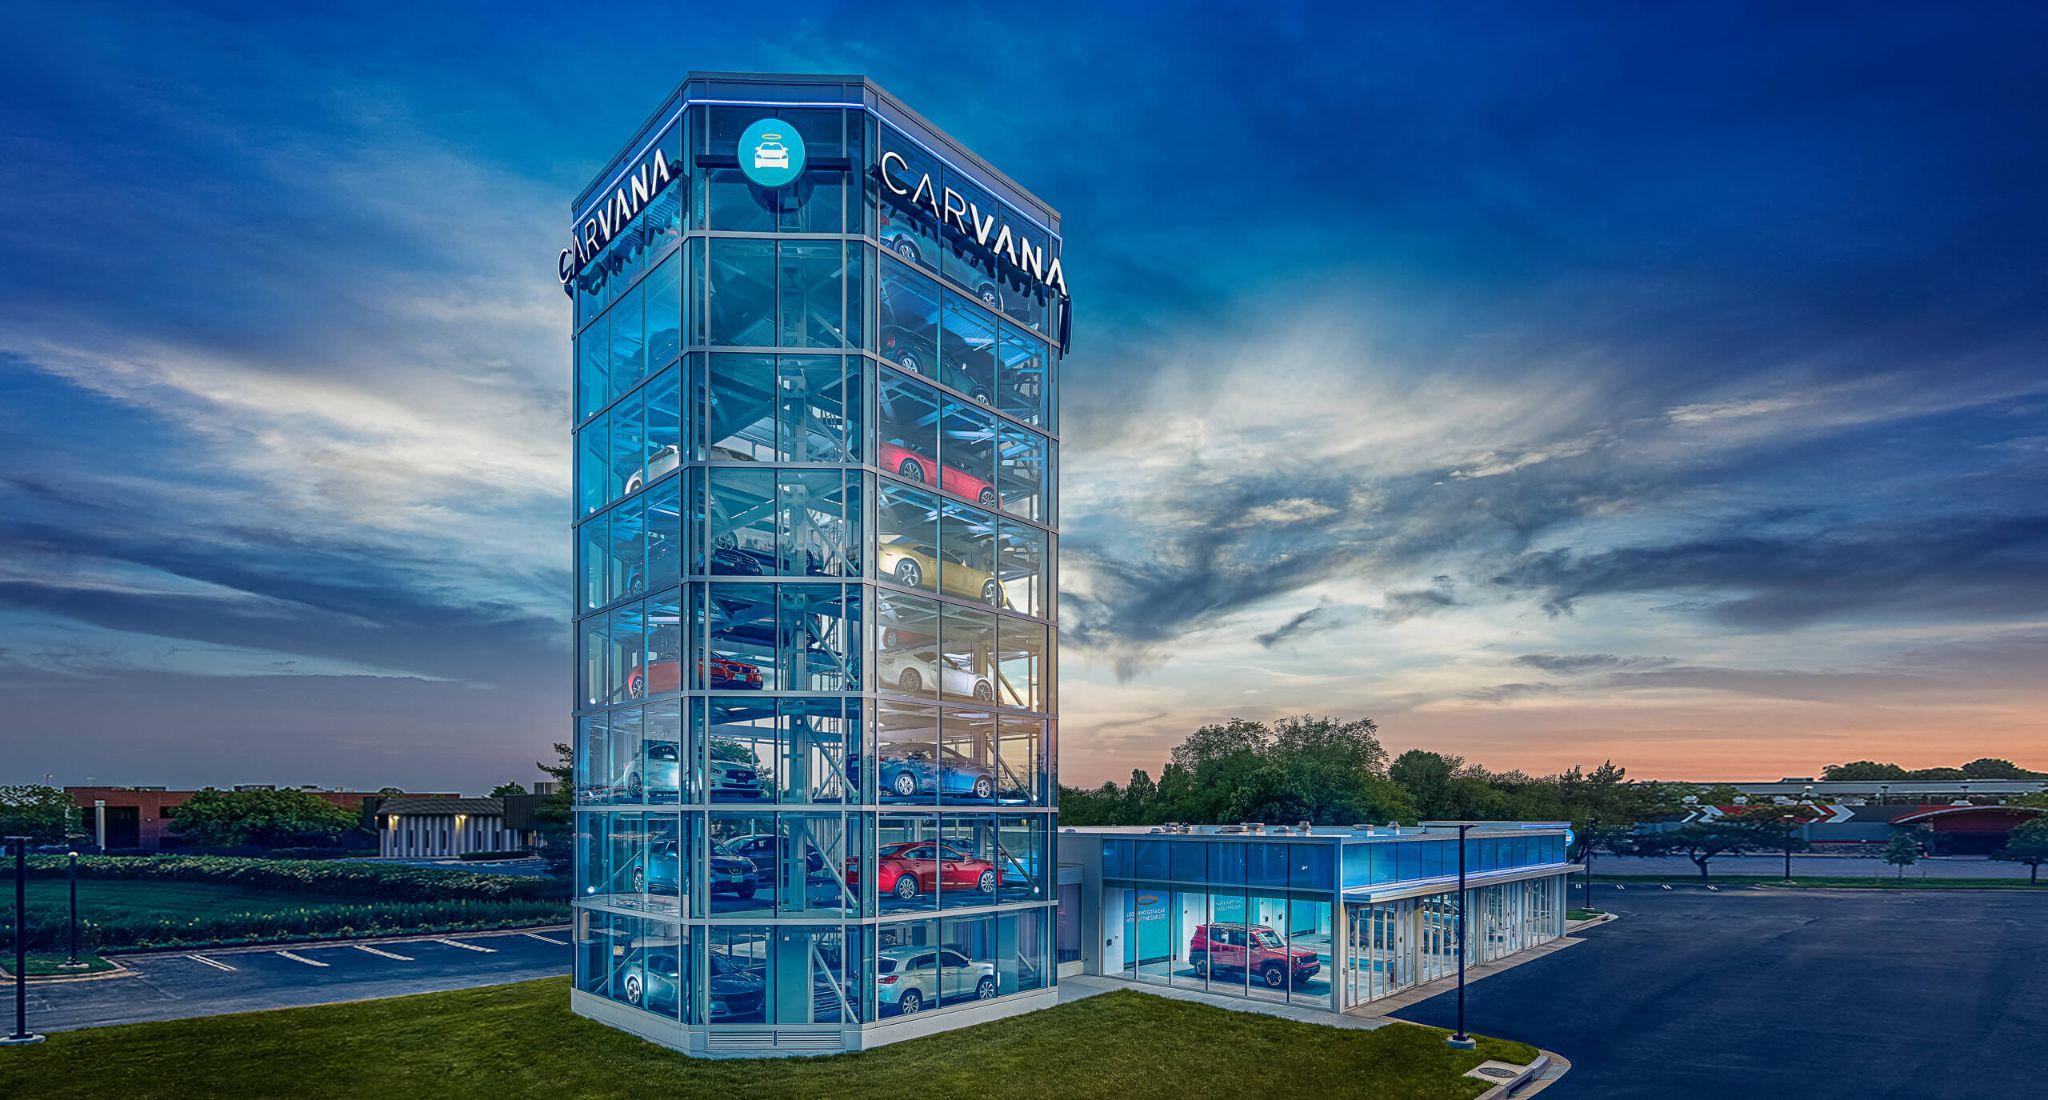 Car vending machines